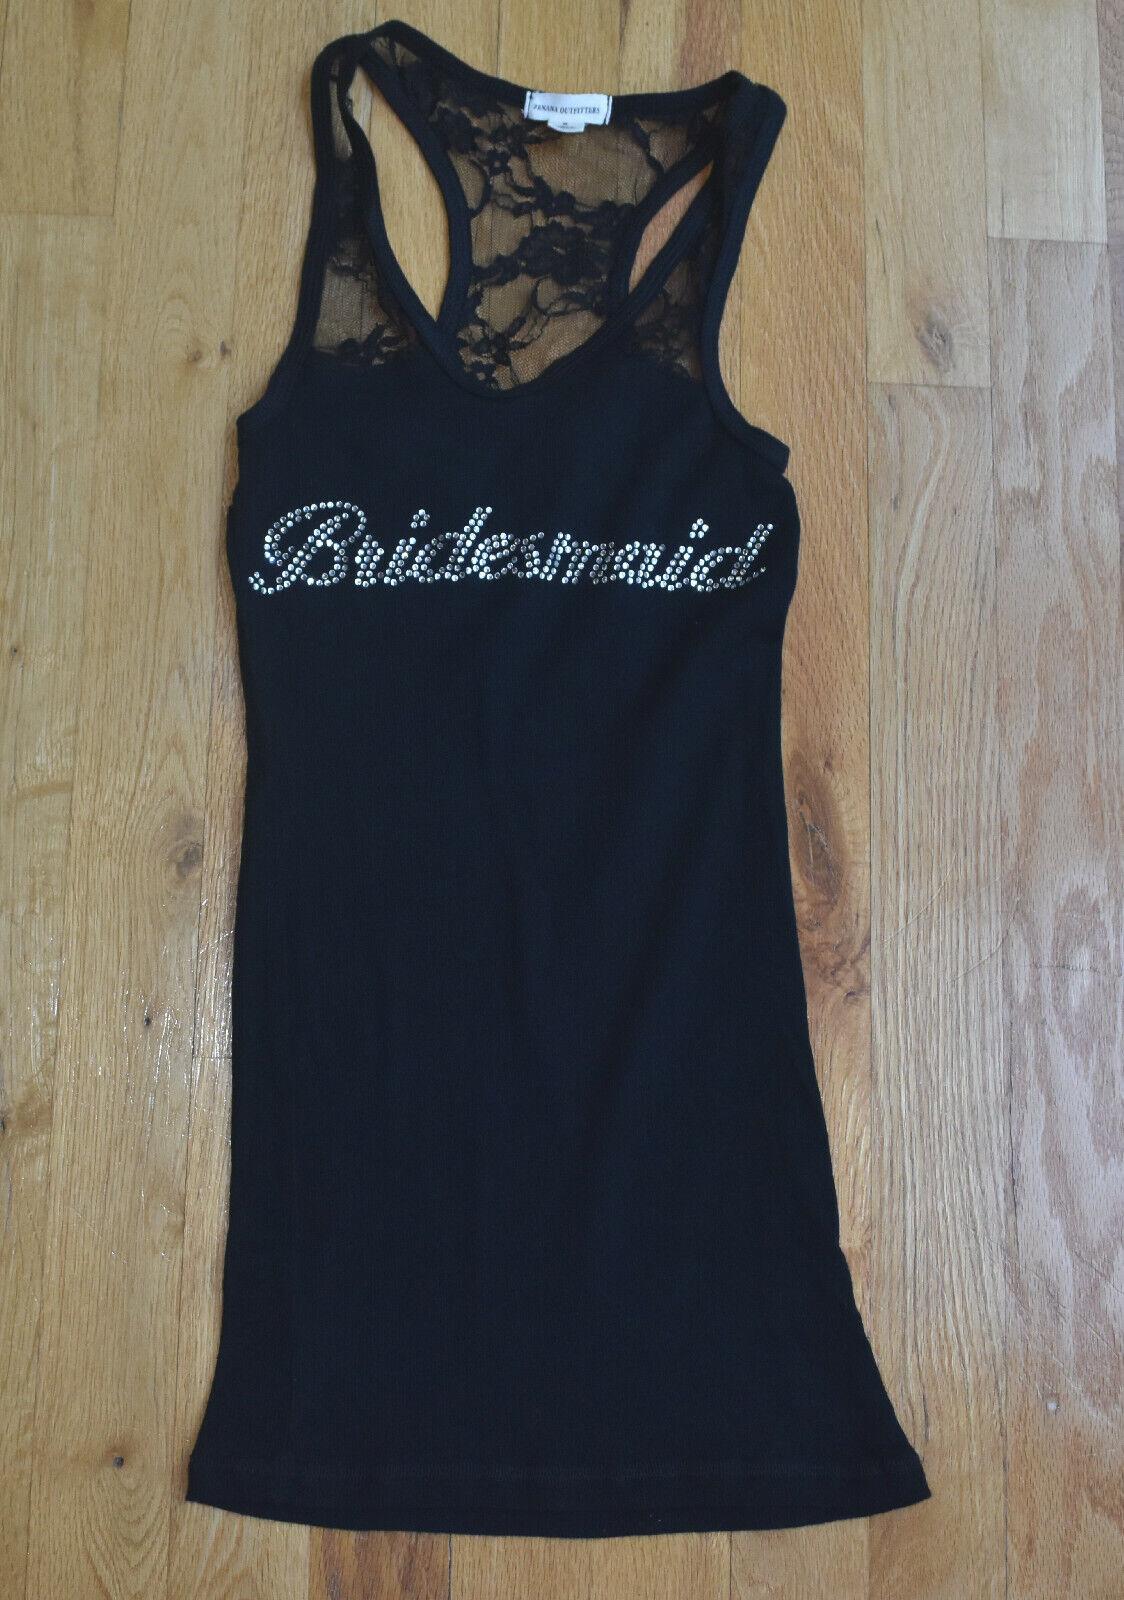 EUC! Zenana Outfitters BRIDESMAID black rhinestone lace racerback top (XS-S)